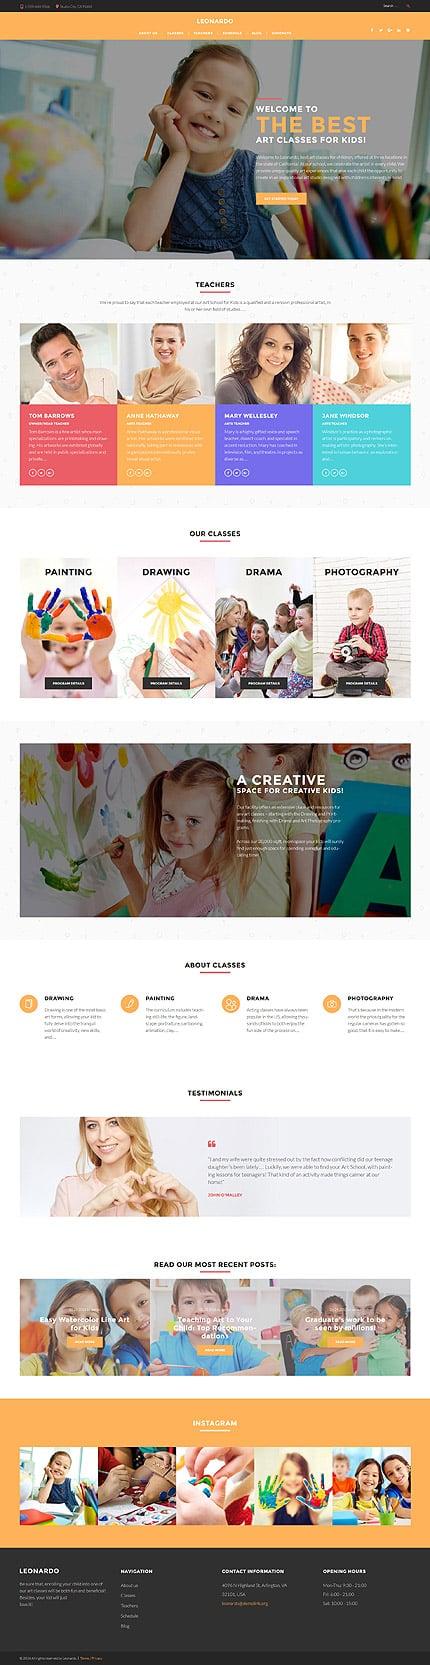 WordPress Theme/Template 60116 Main Page Screenshot